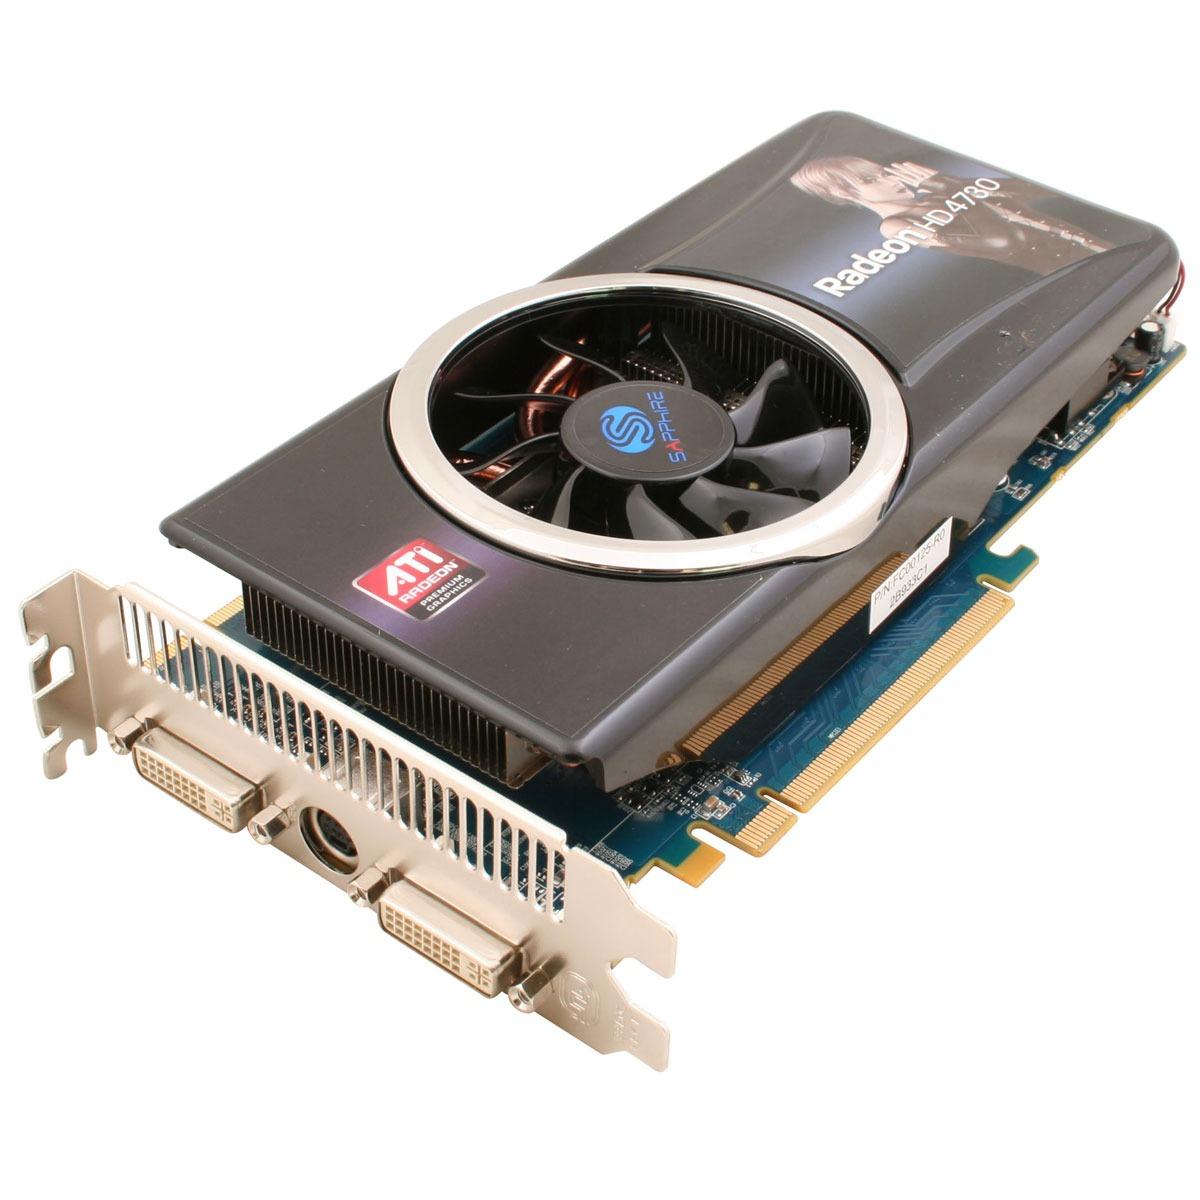 Carte graphique Sapphire Radeon HD 4730 512 MB Sapphire Radeon HD 4730 - 512 Mo TV-Out/Dual DVI - PCI-Express (ATI Radeon HD 4730)